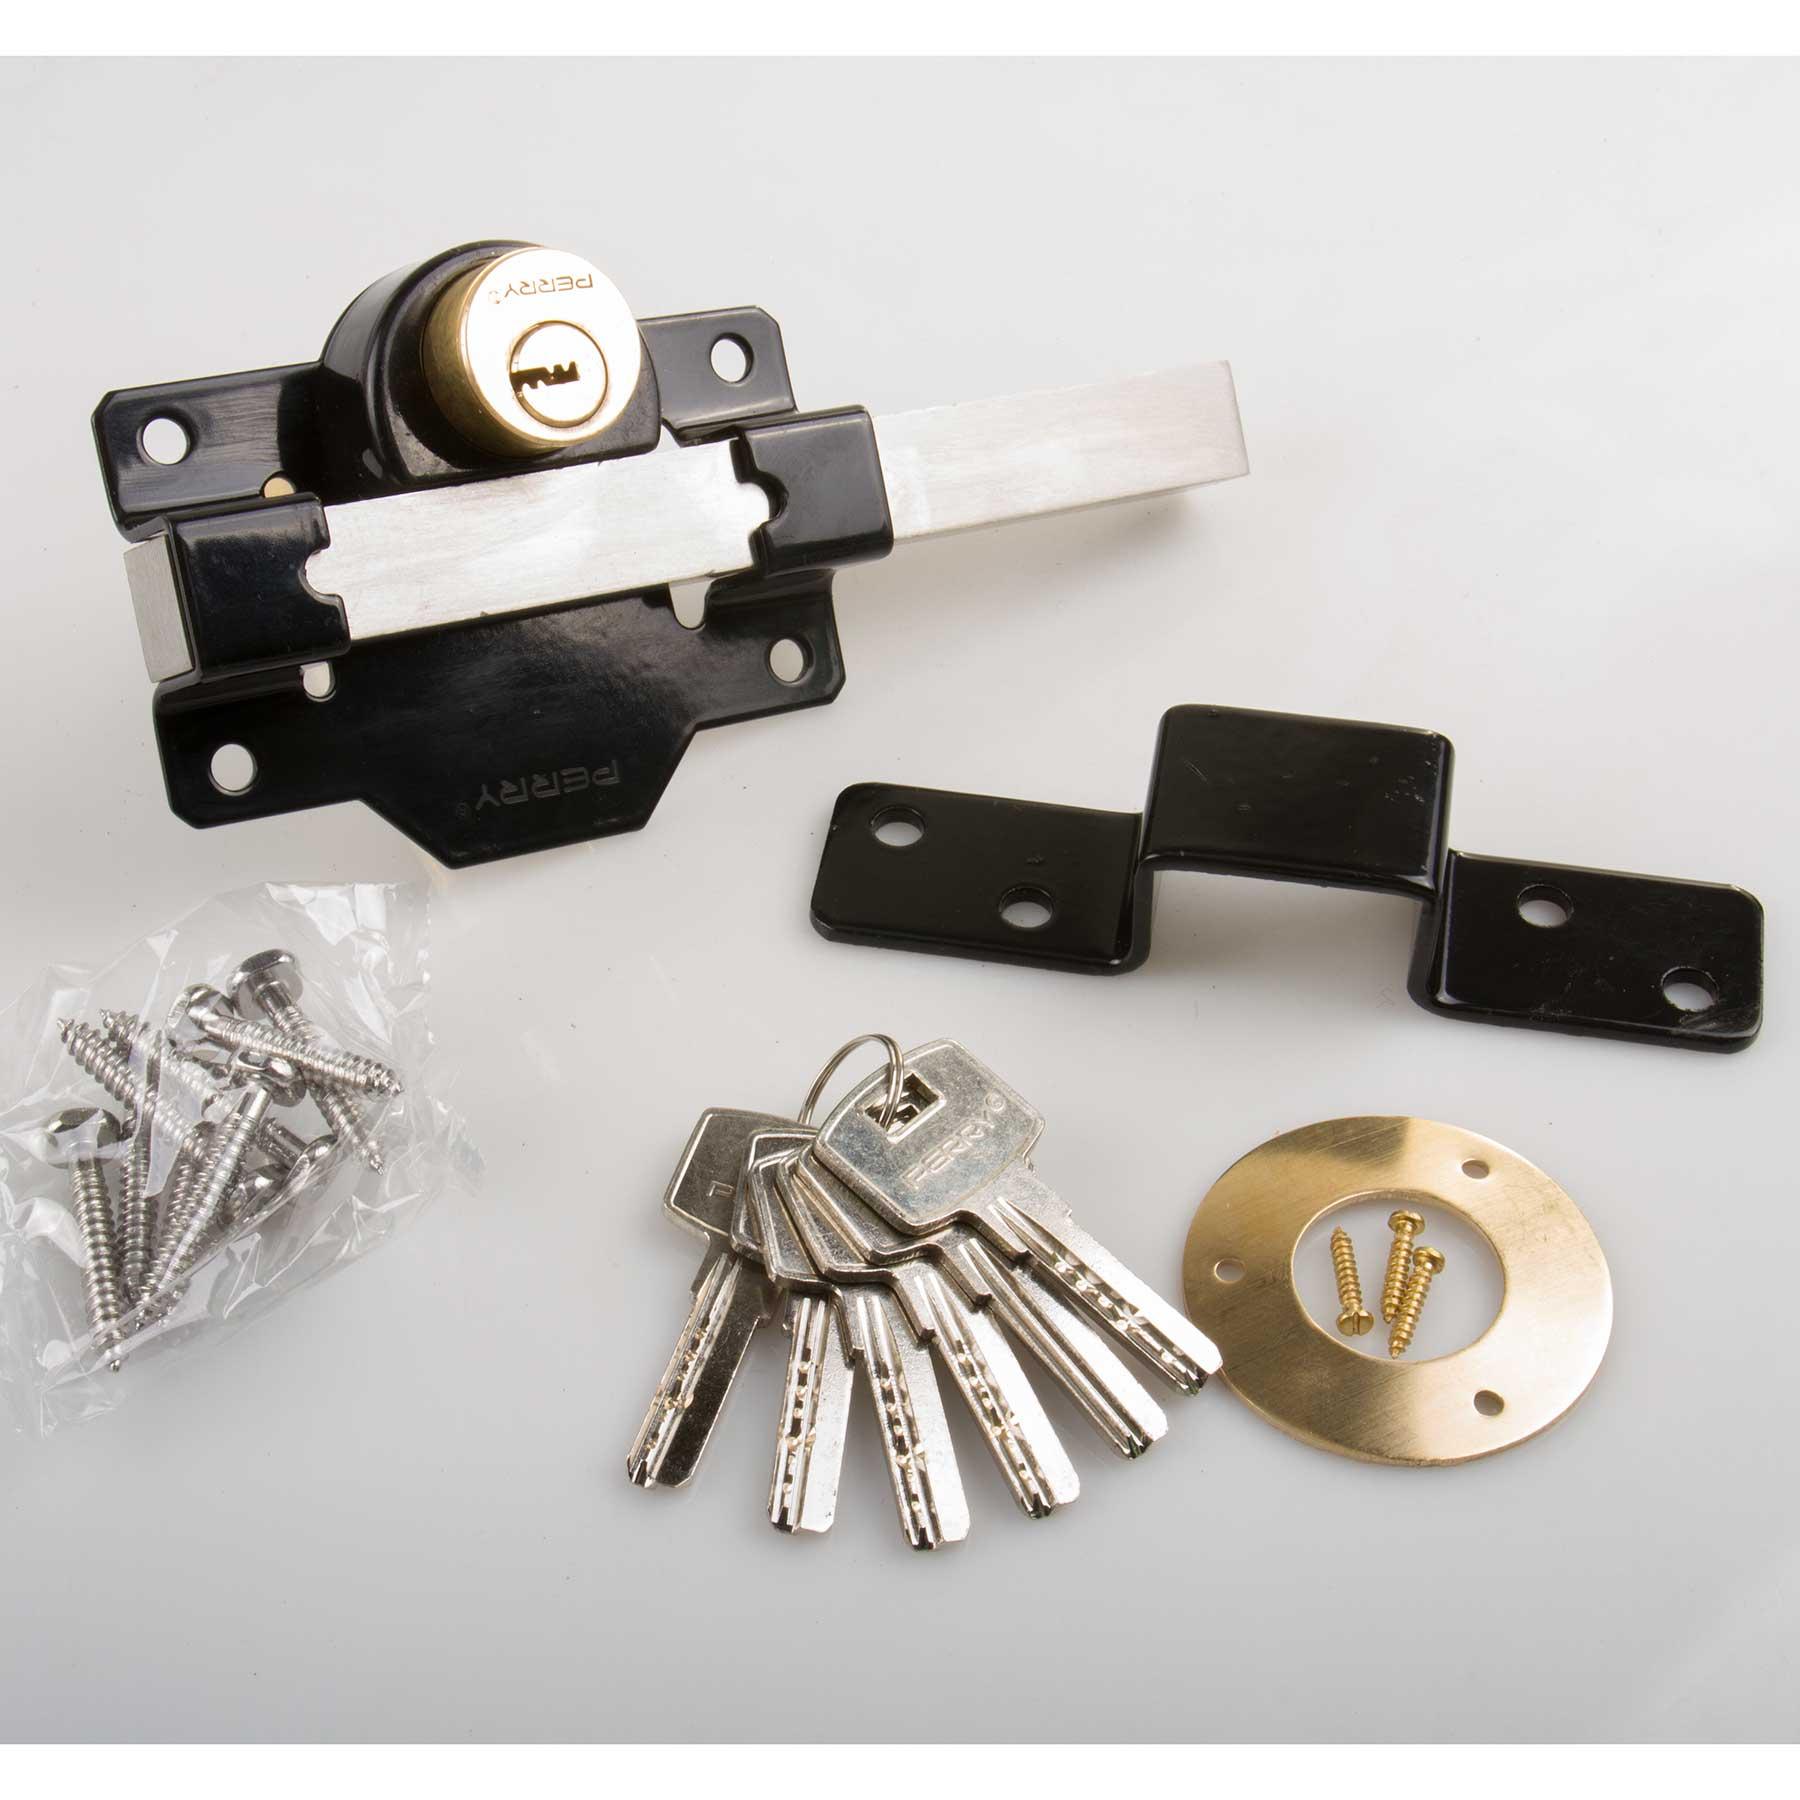 Perry Garden Gate 50mm Rim Long Throw Lock Double Locking Keyed Alike Perry Garden Gate 50mm